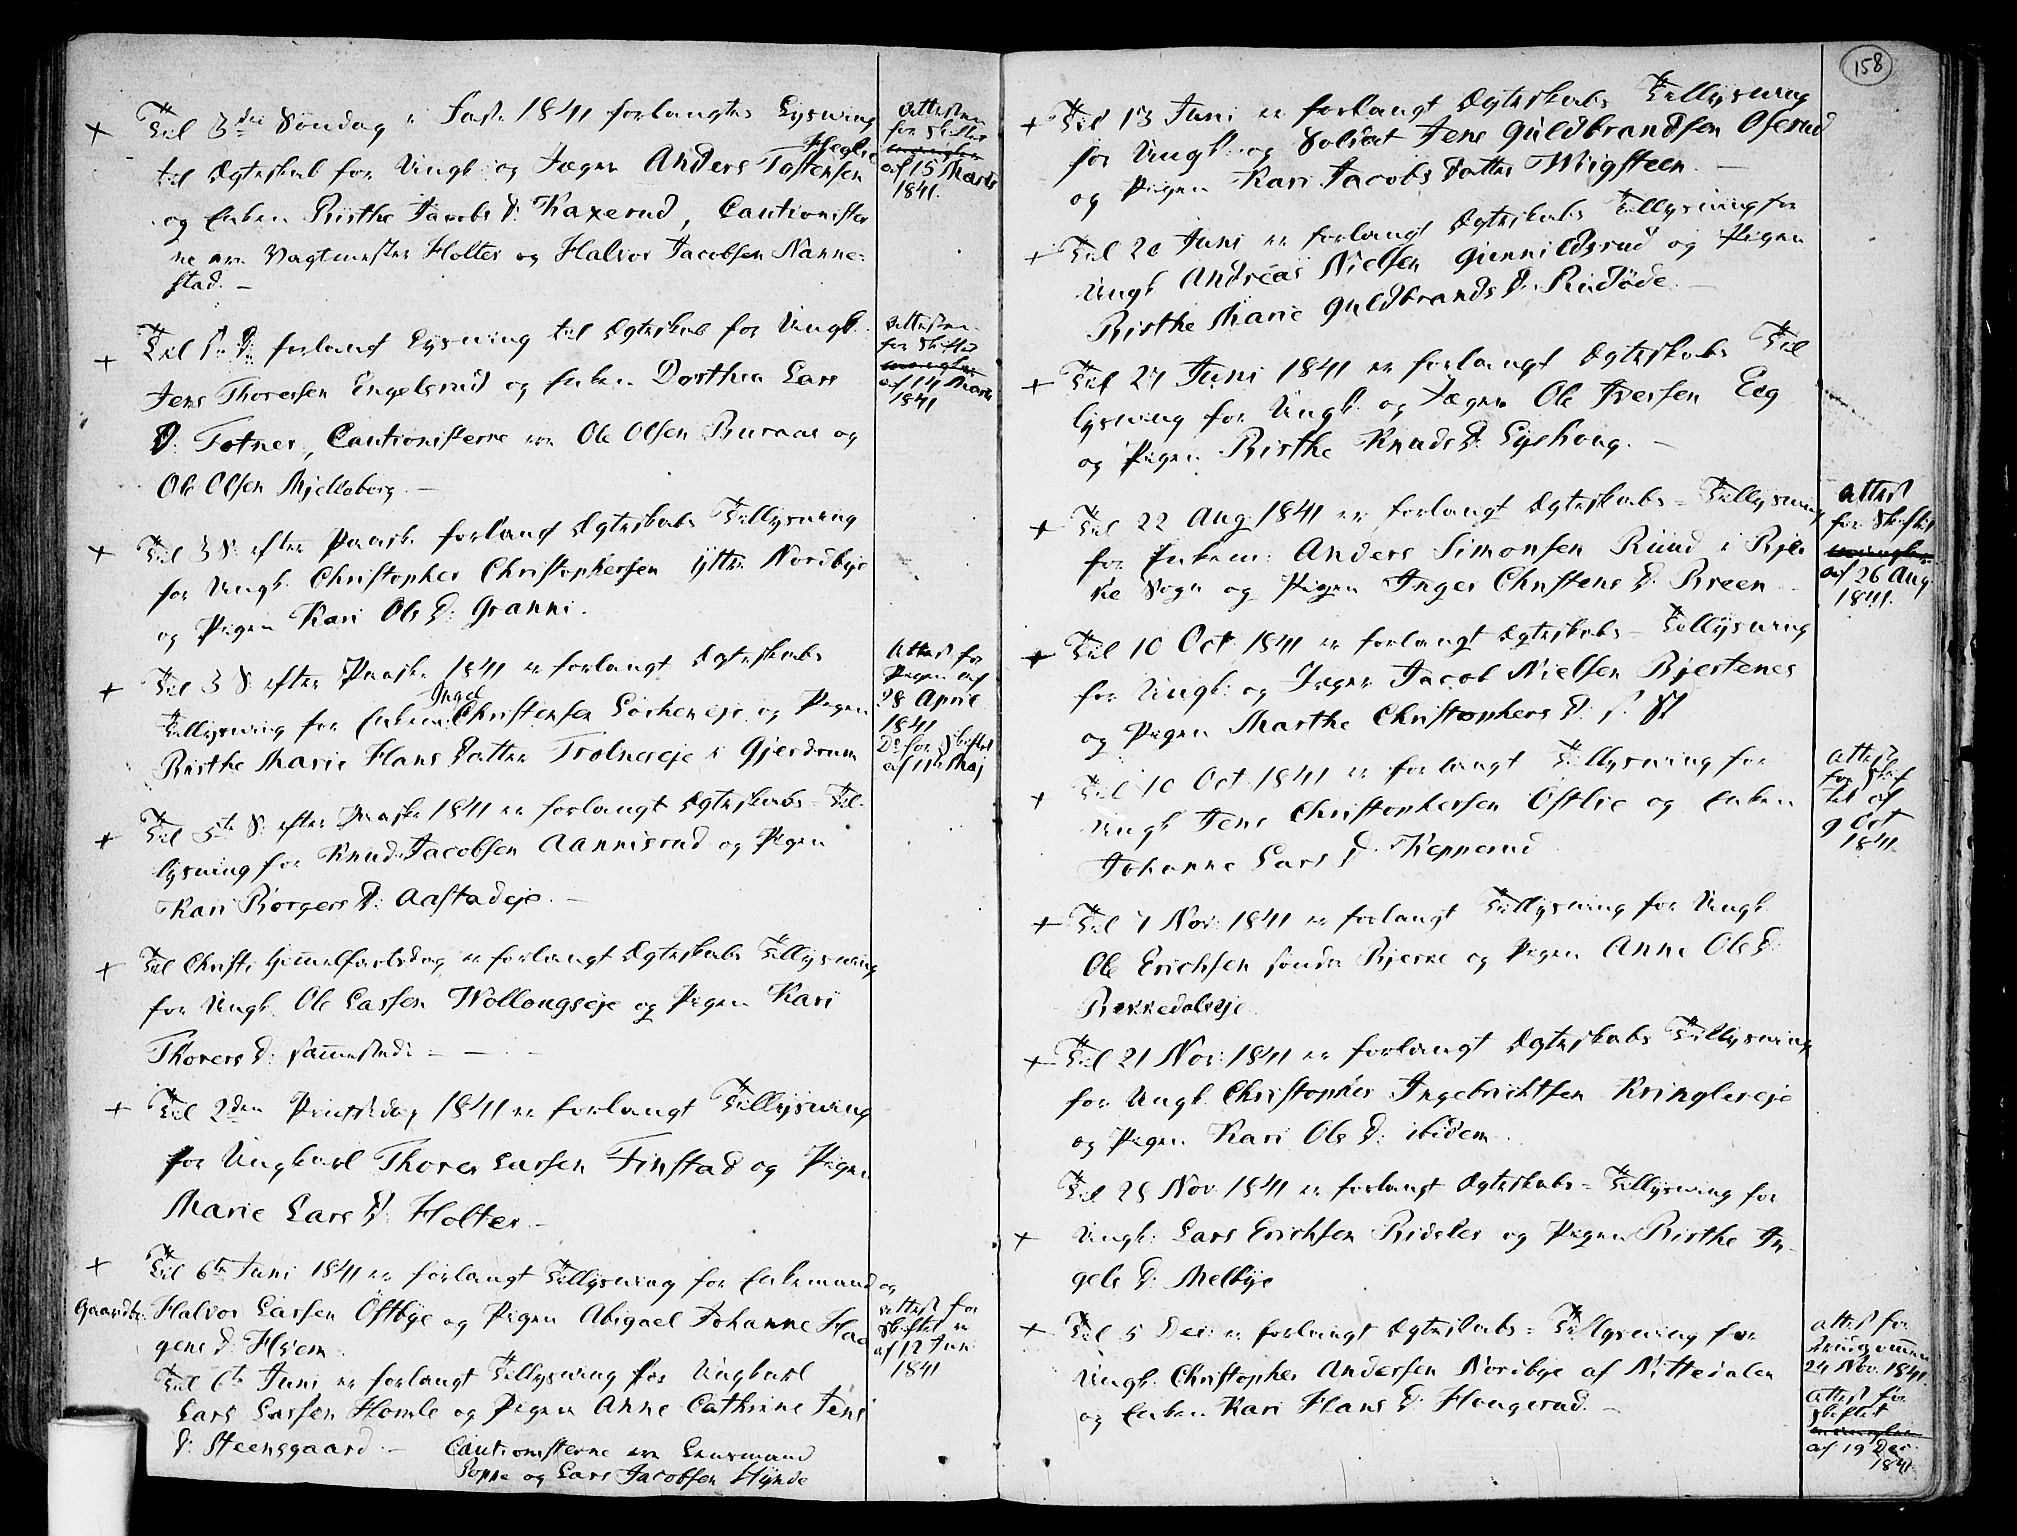 SAO, Nannestad prestekontor Kirkebøker, F/Fa/L0008: Ministerialbok nr. I 8, 1791-1814, s. 158